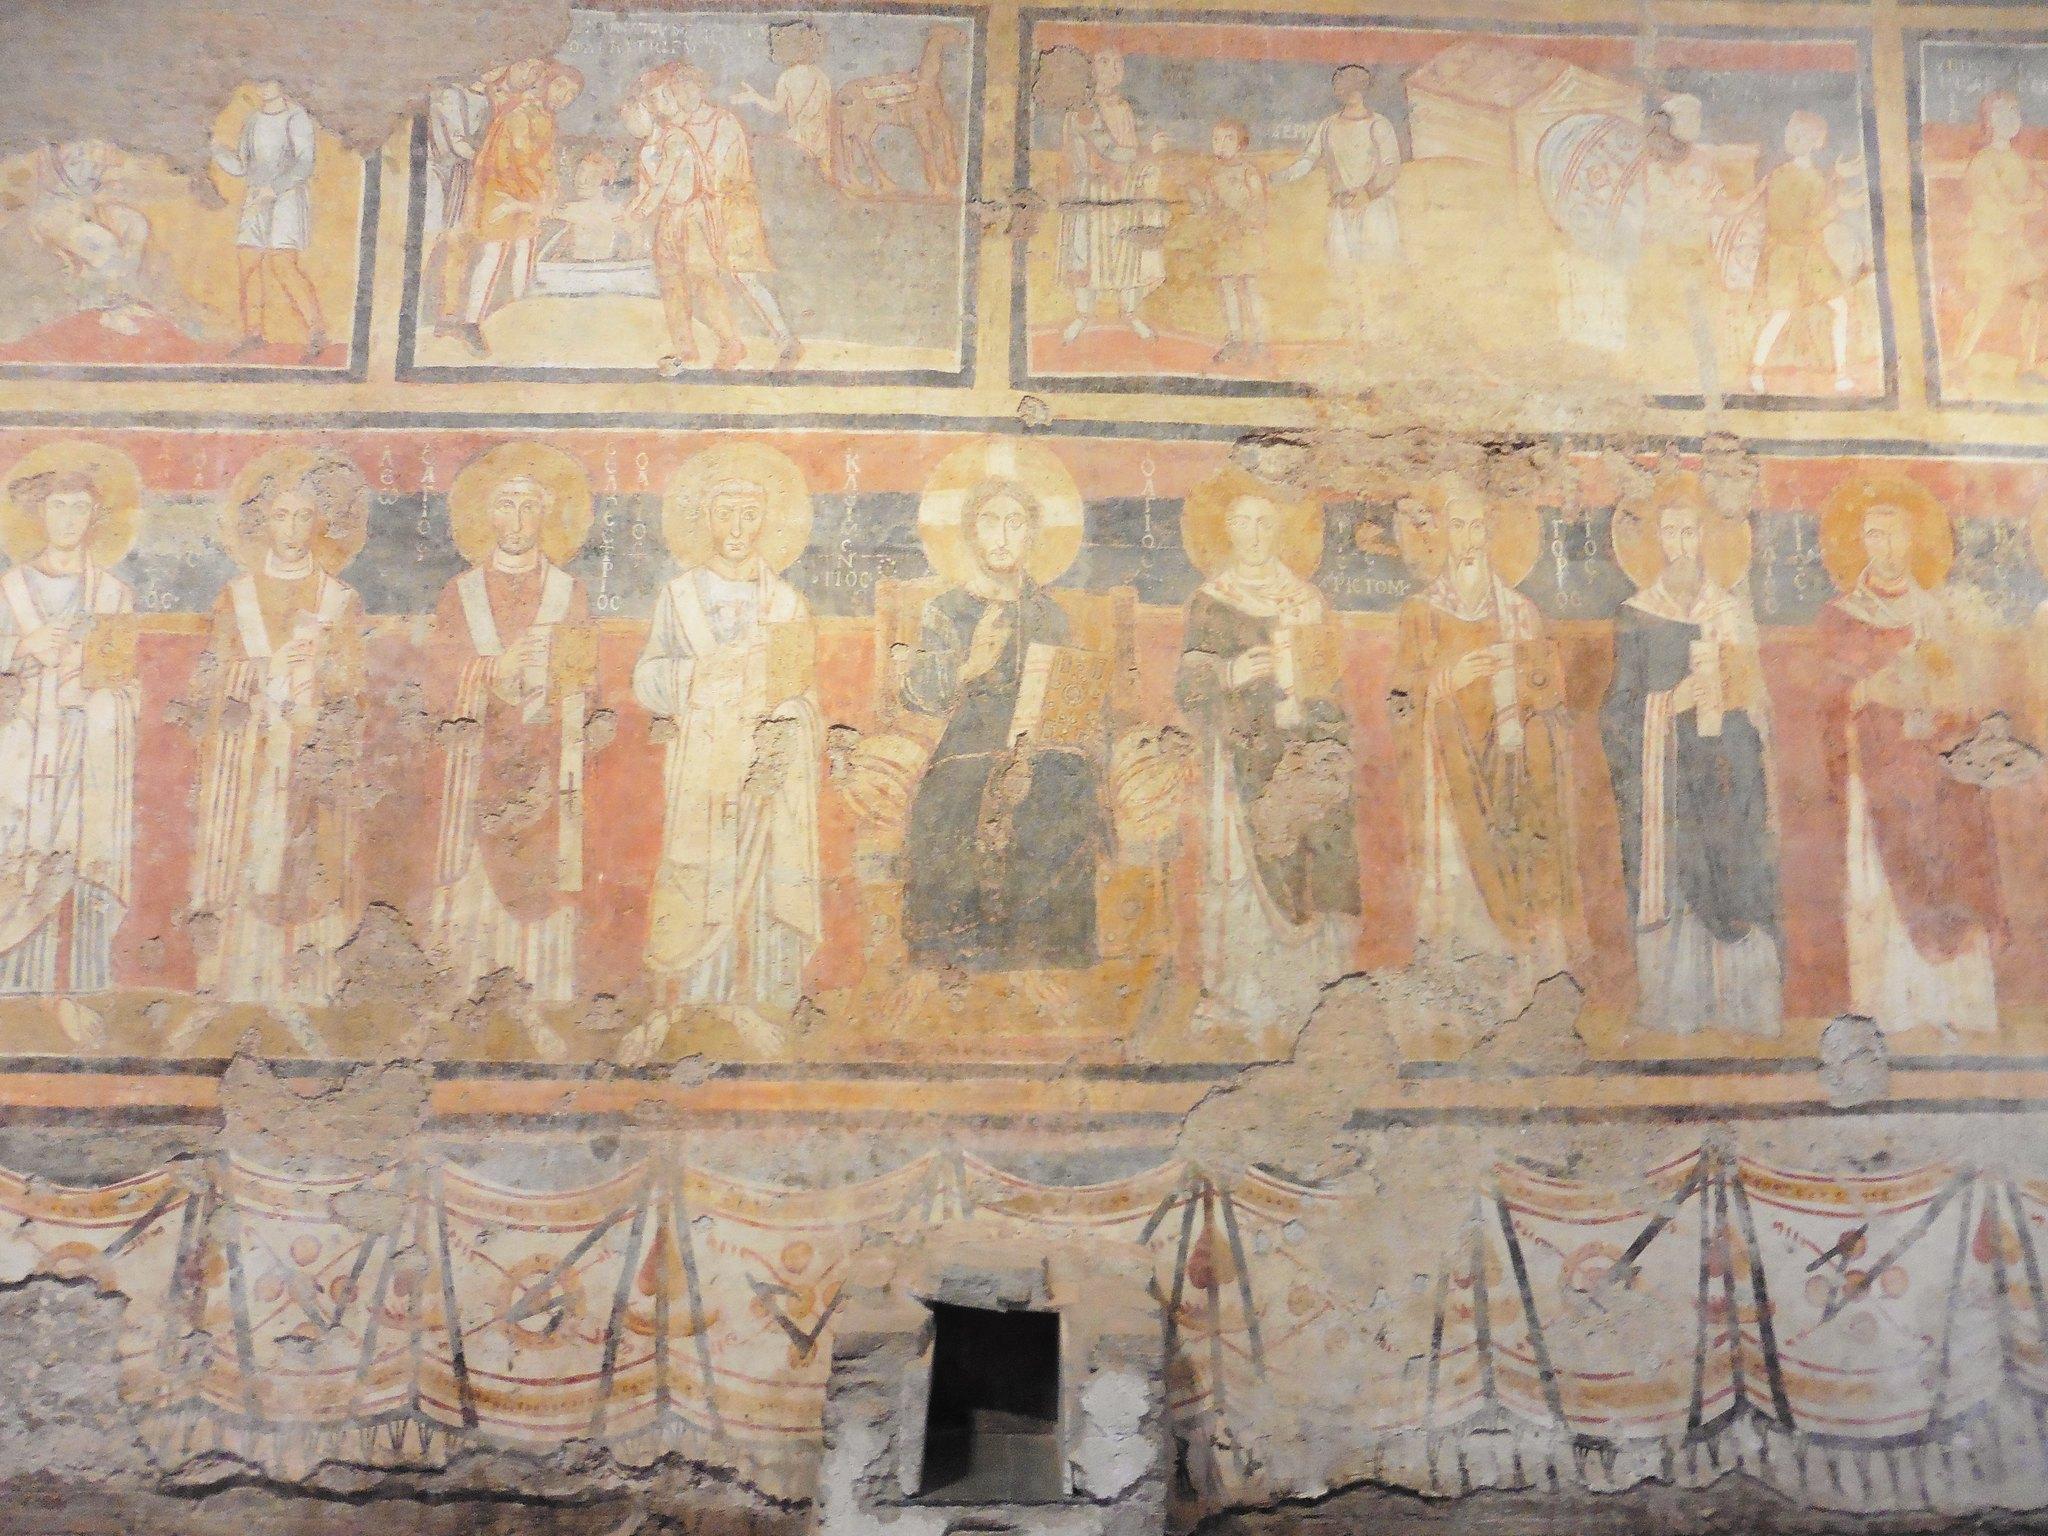 Artwork in Roman Forum